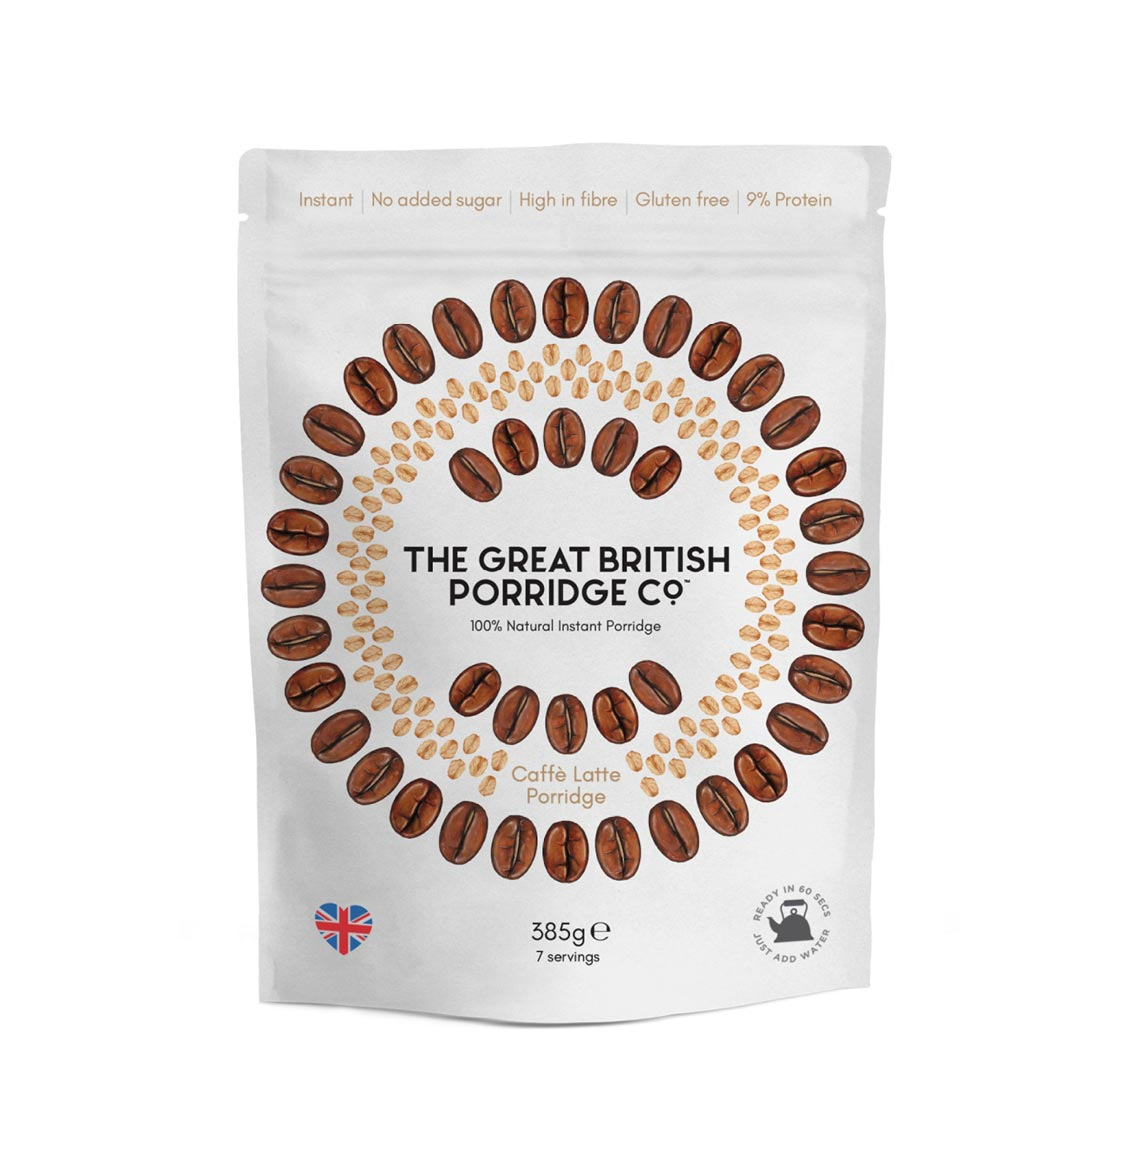 The Great British Porridge Cafe Latte 385g